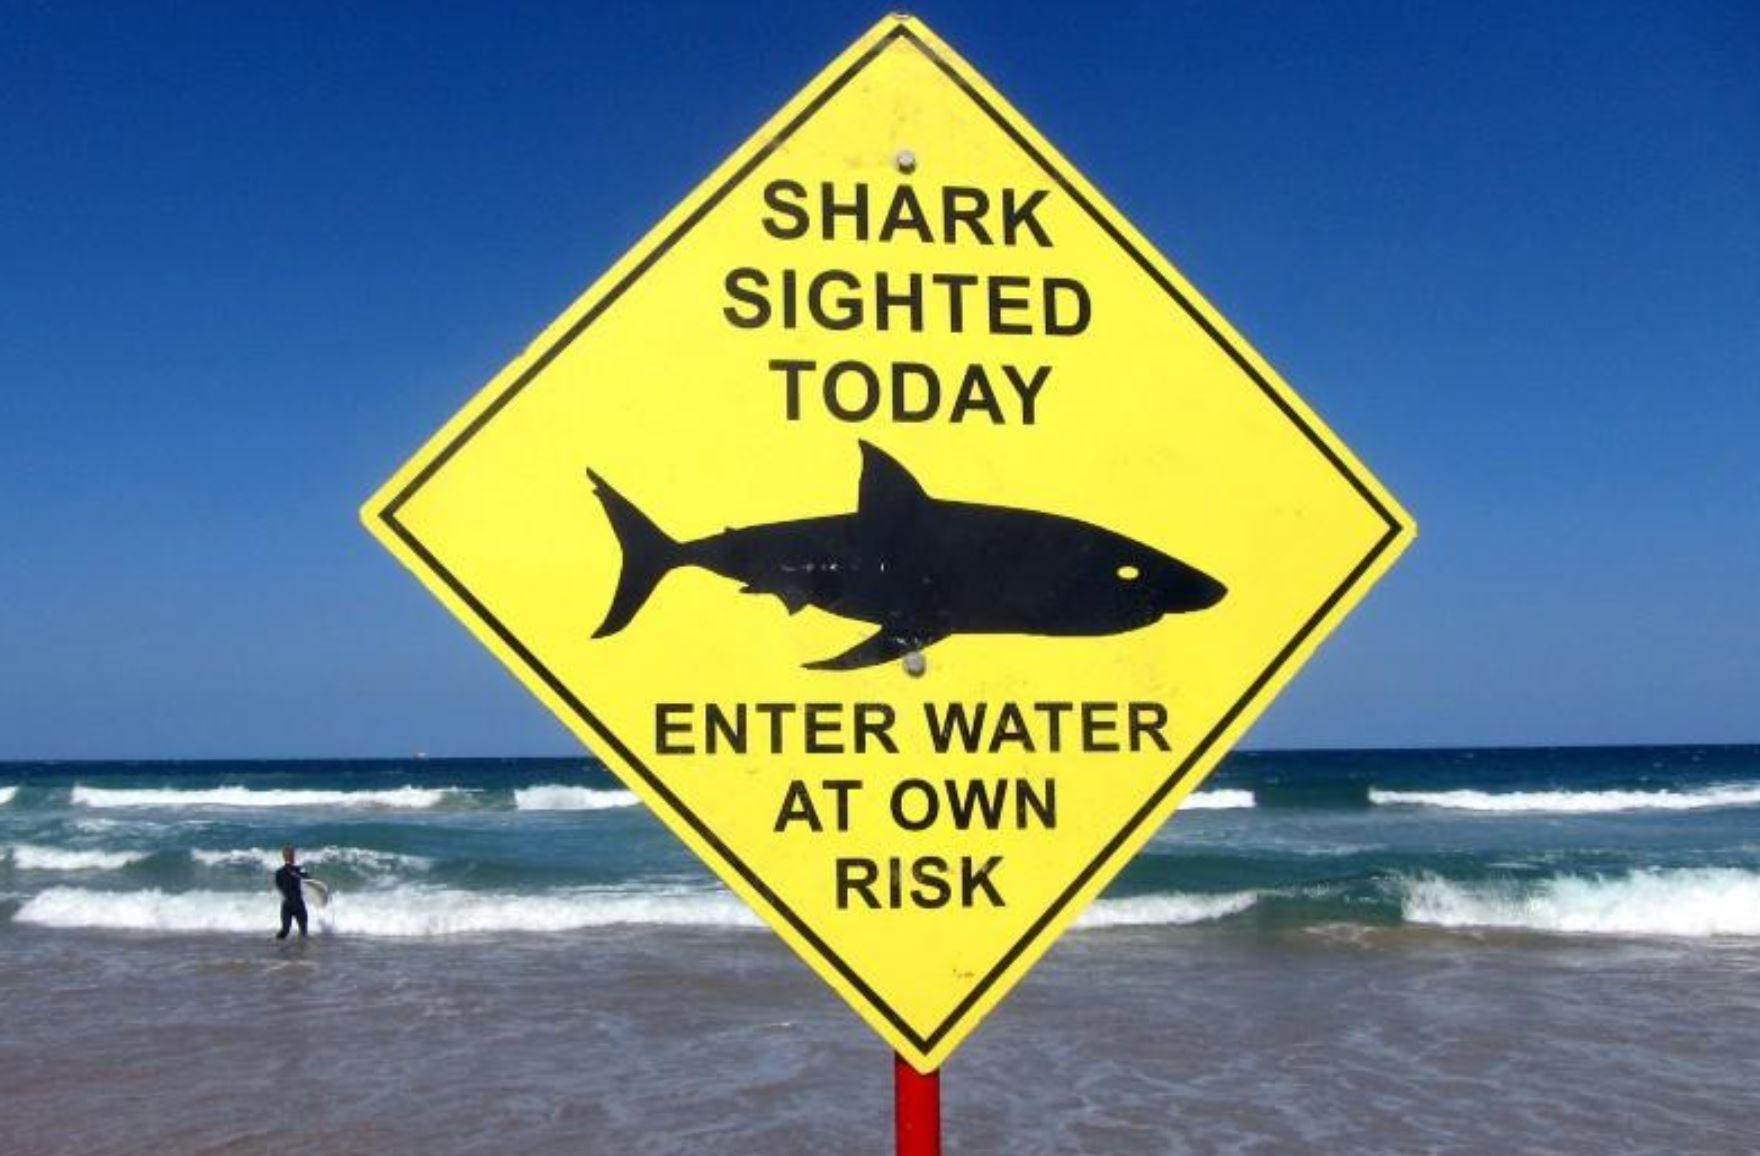 Teen killed in suspected shark attack off Australian coast, says police